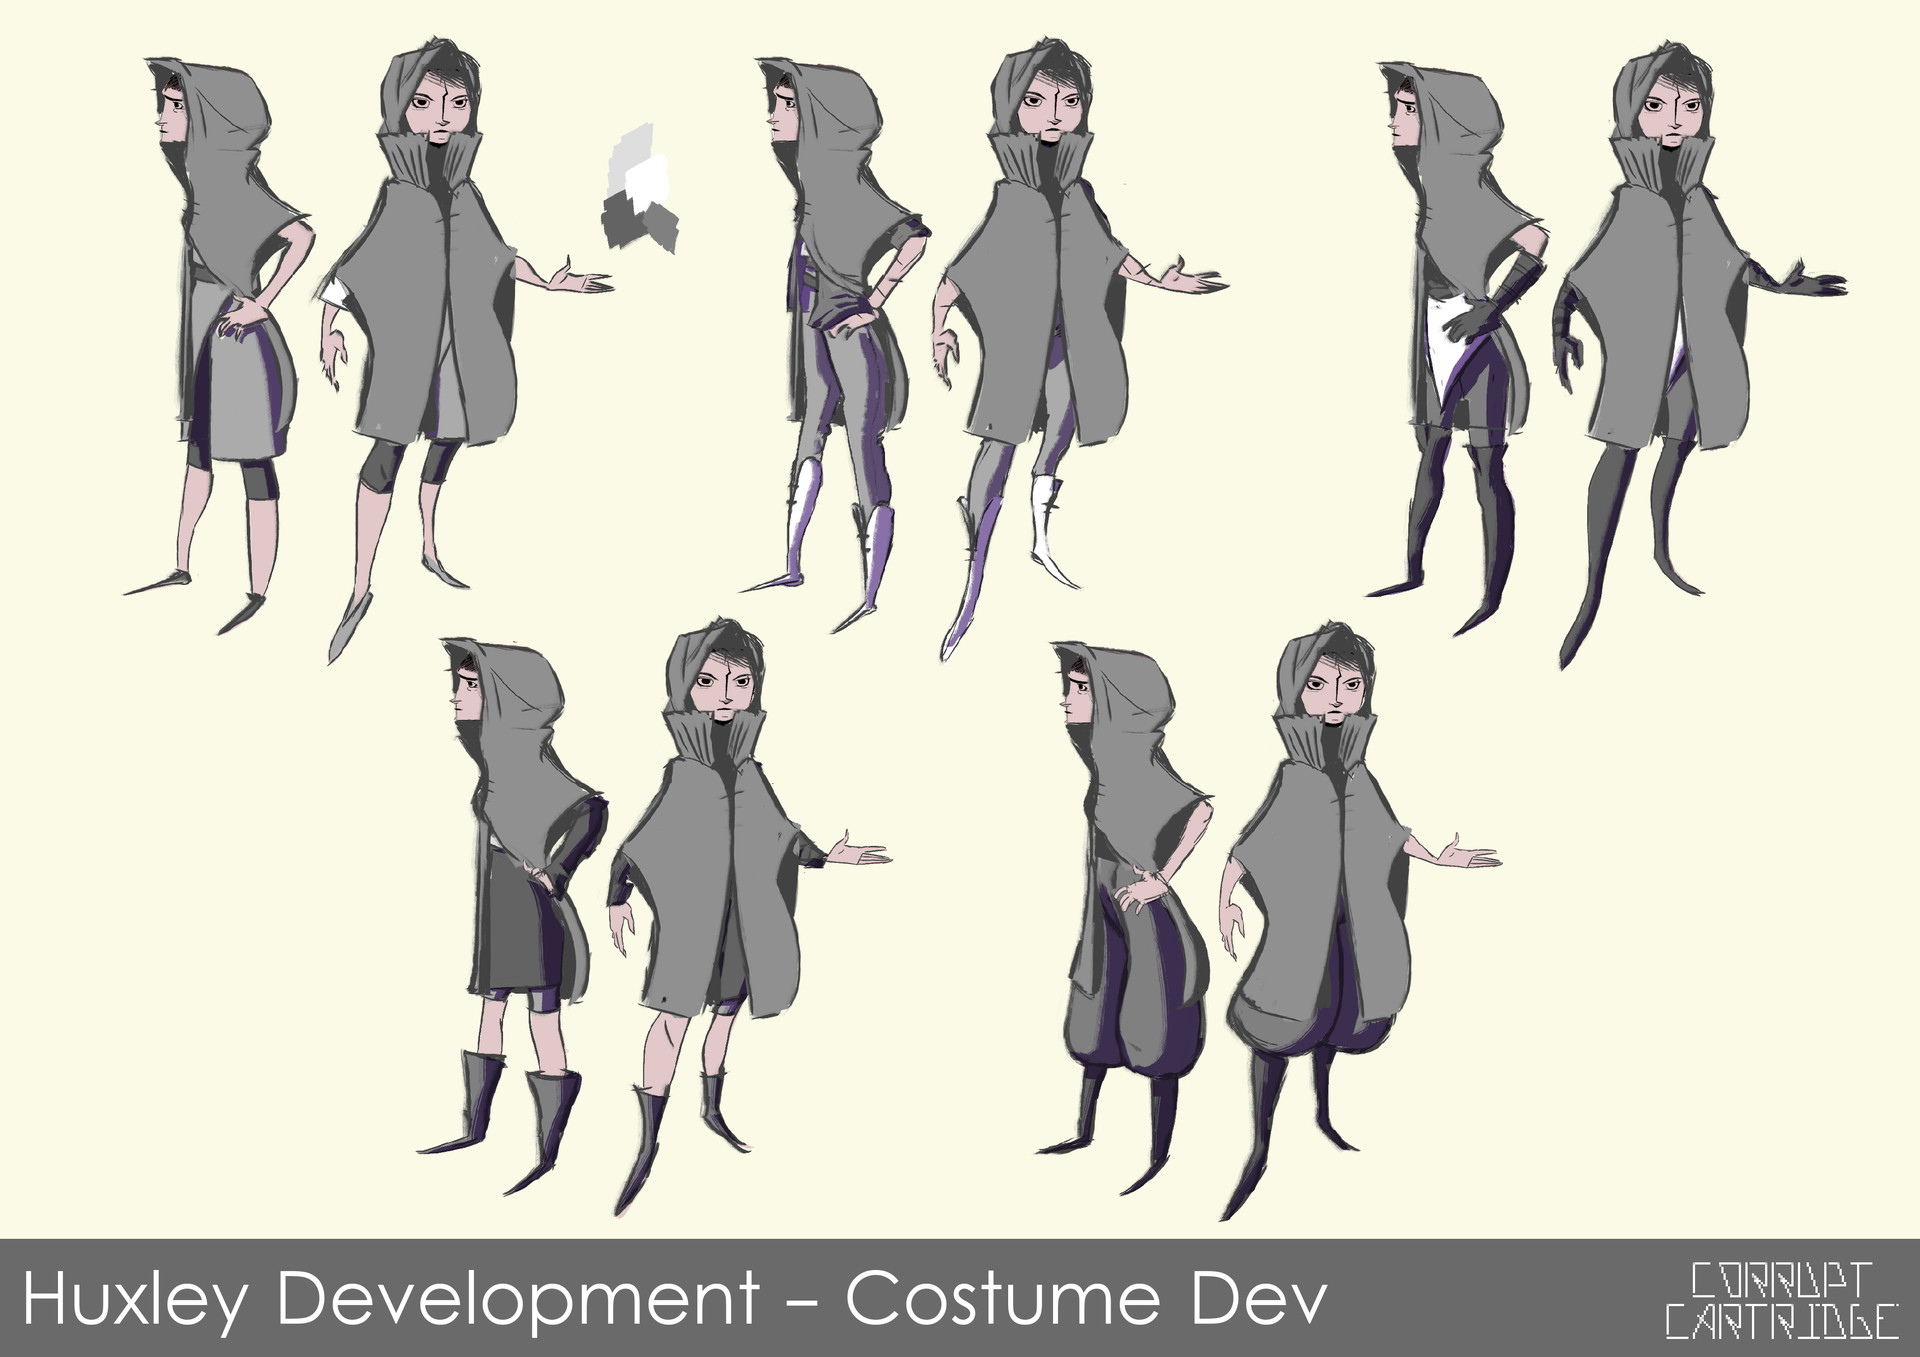 Craig mullins 06 huxley costume concepts 03